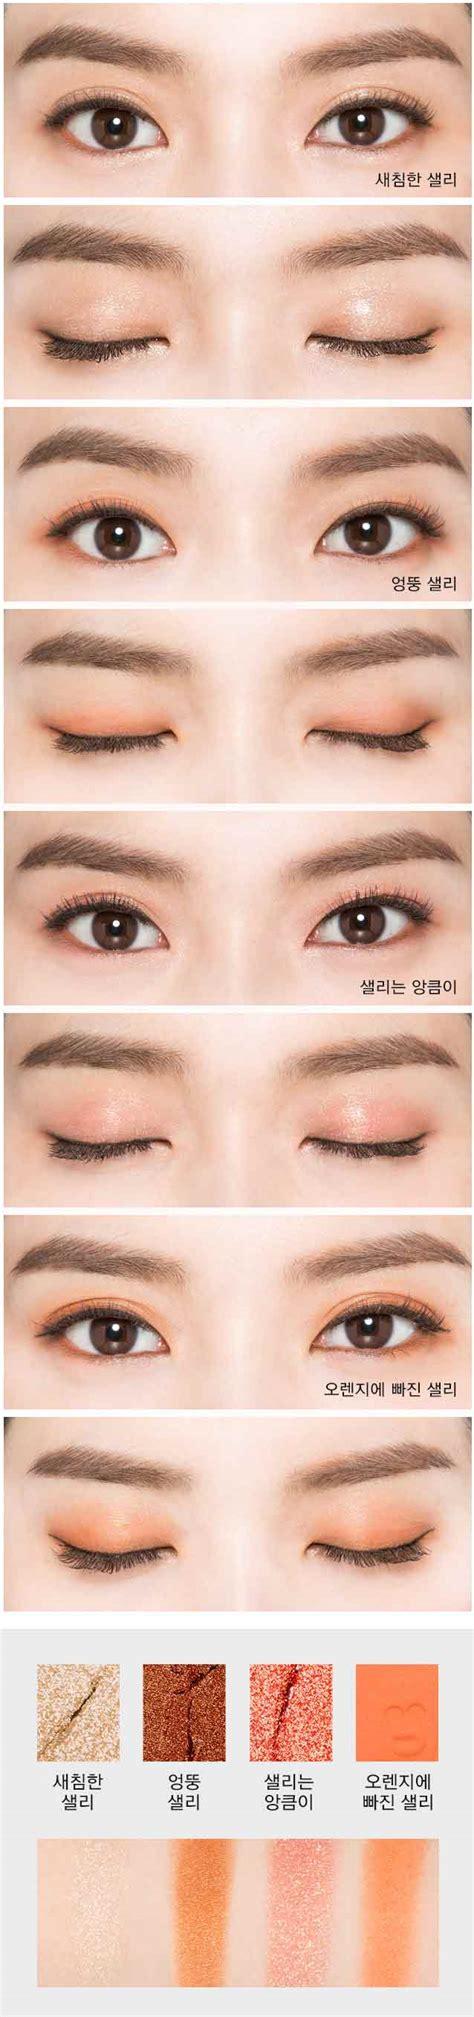 Missha Eye Color Studio Mini Sally by Box Korea Missha Eye Color Studio Mini 7 2g Line